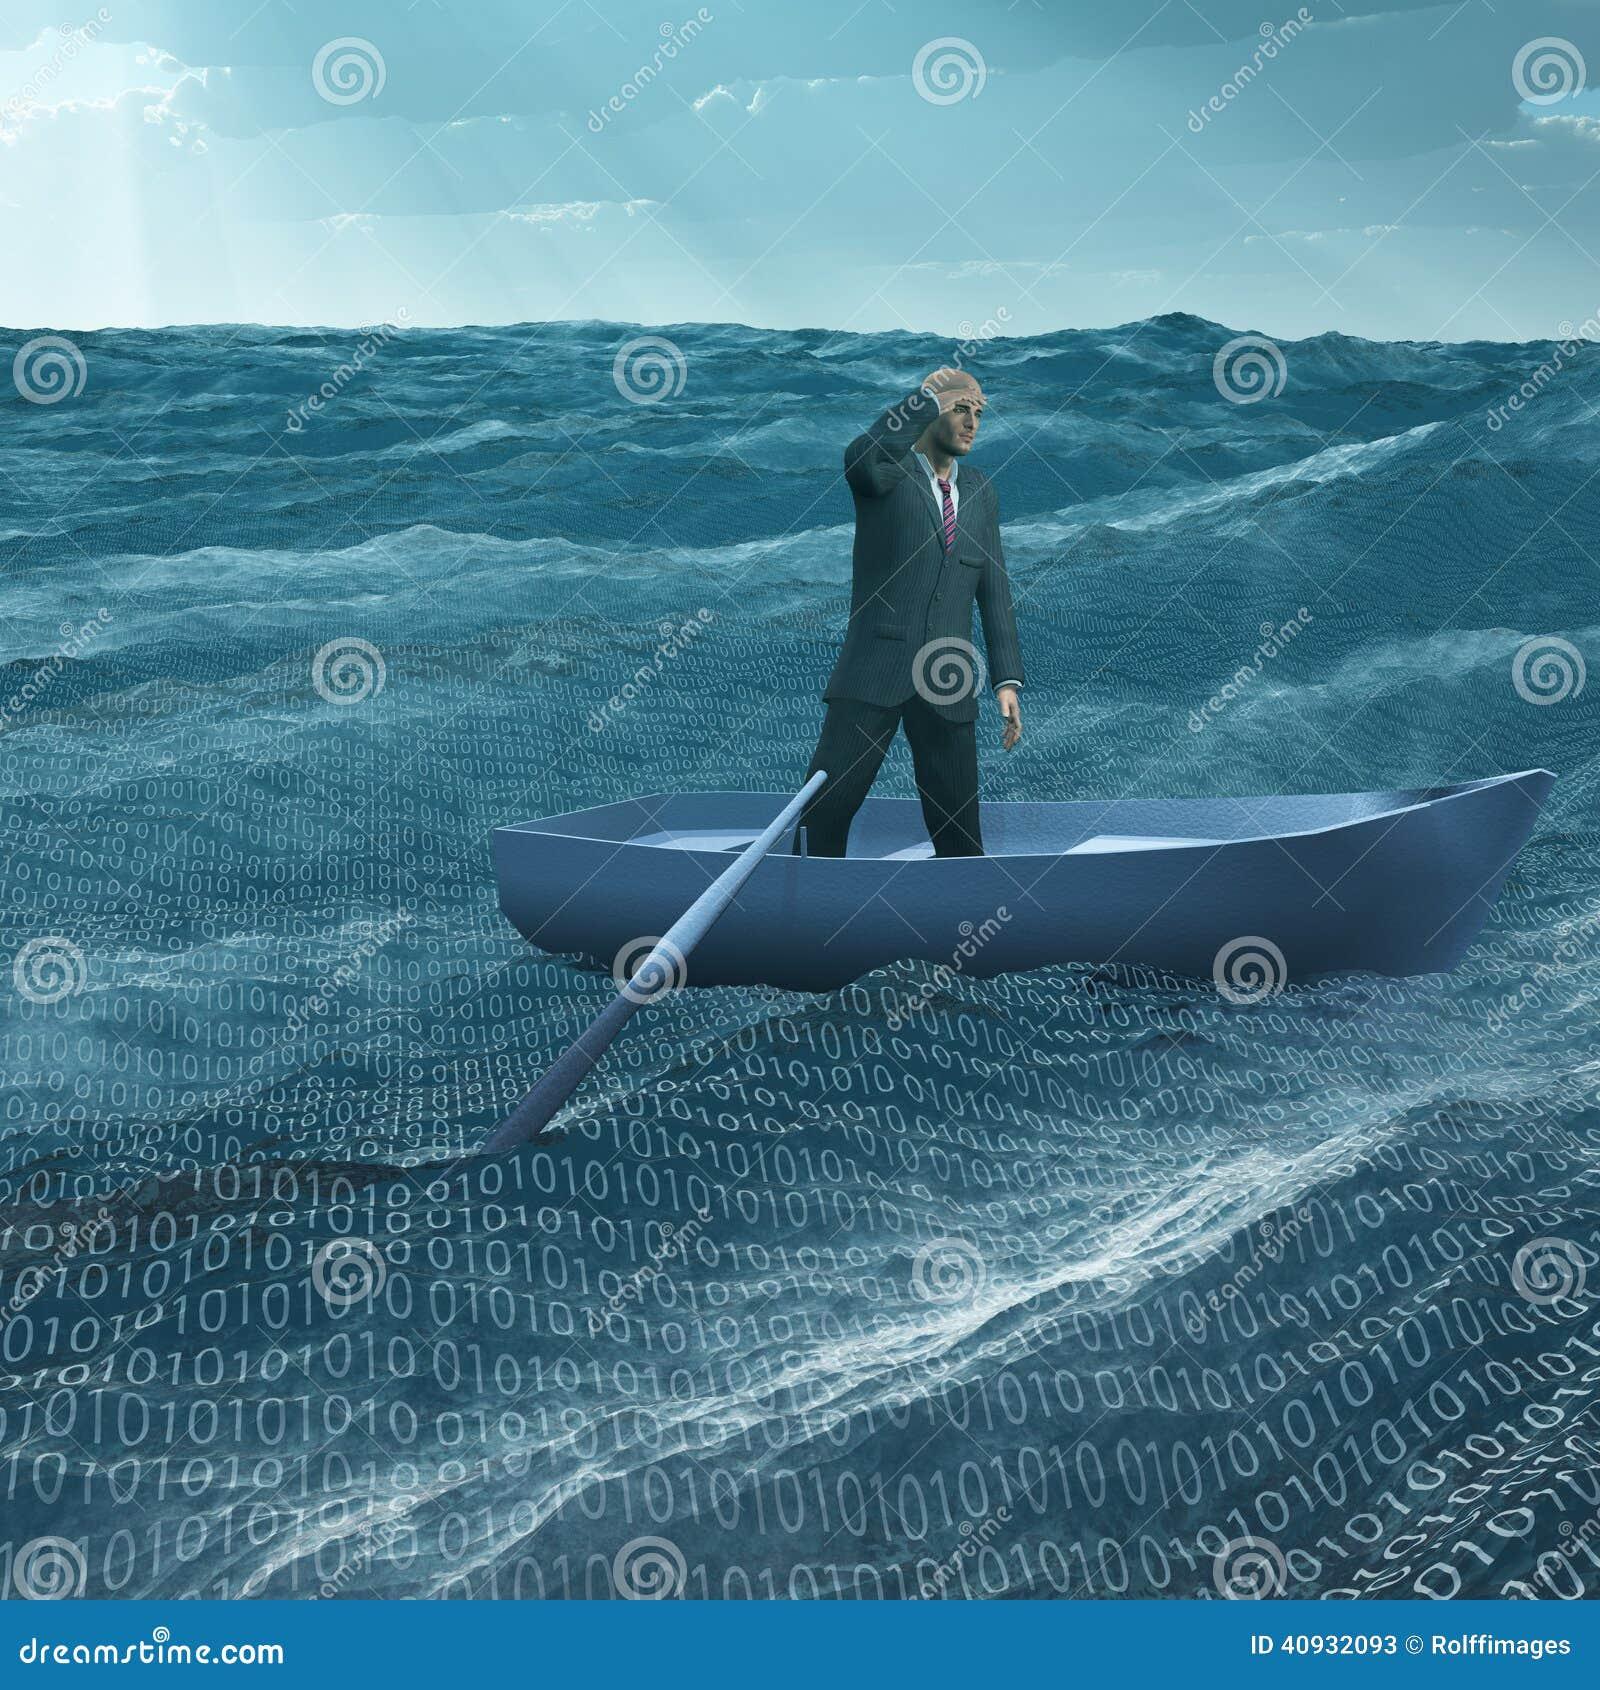 Man Adrift In Tiny Boat Stock Illustration - Image: 40932093